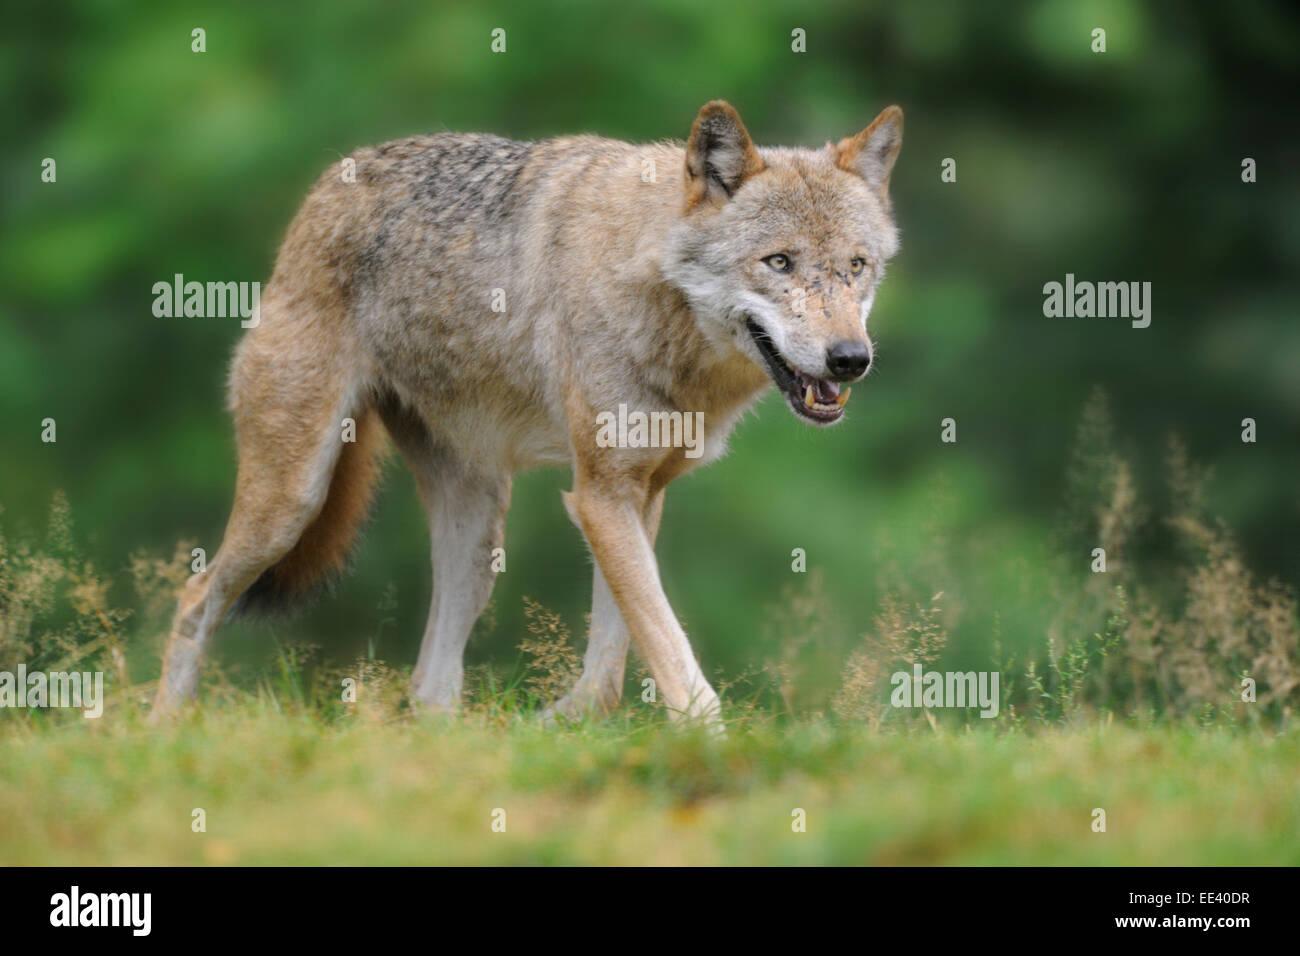 Eurasian wolf [Canis lupus lupus] - Stock Image